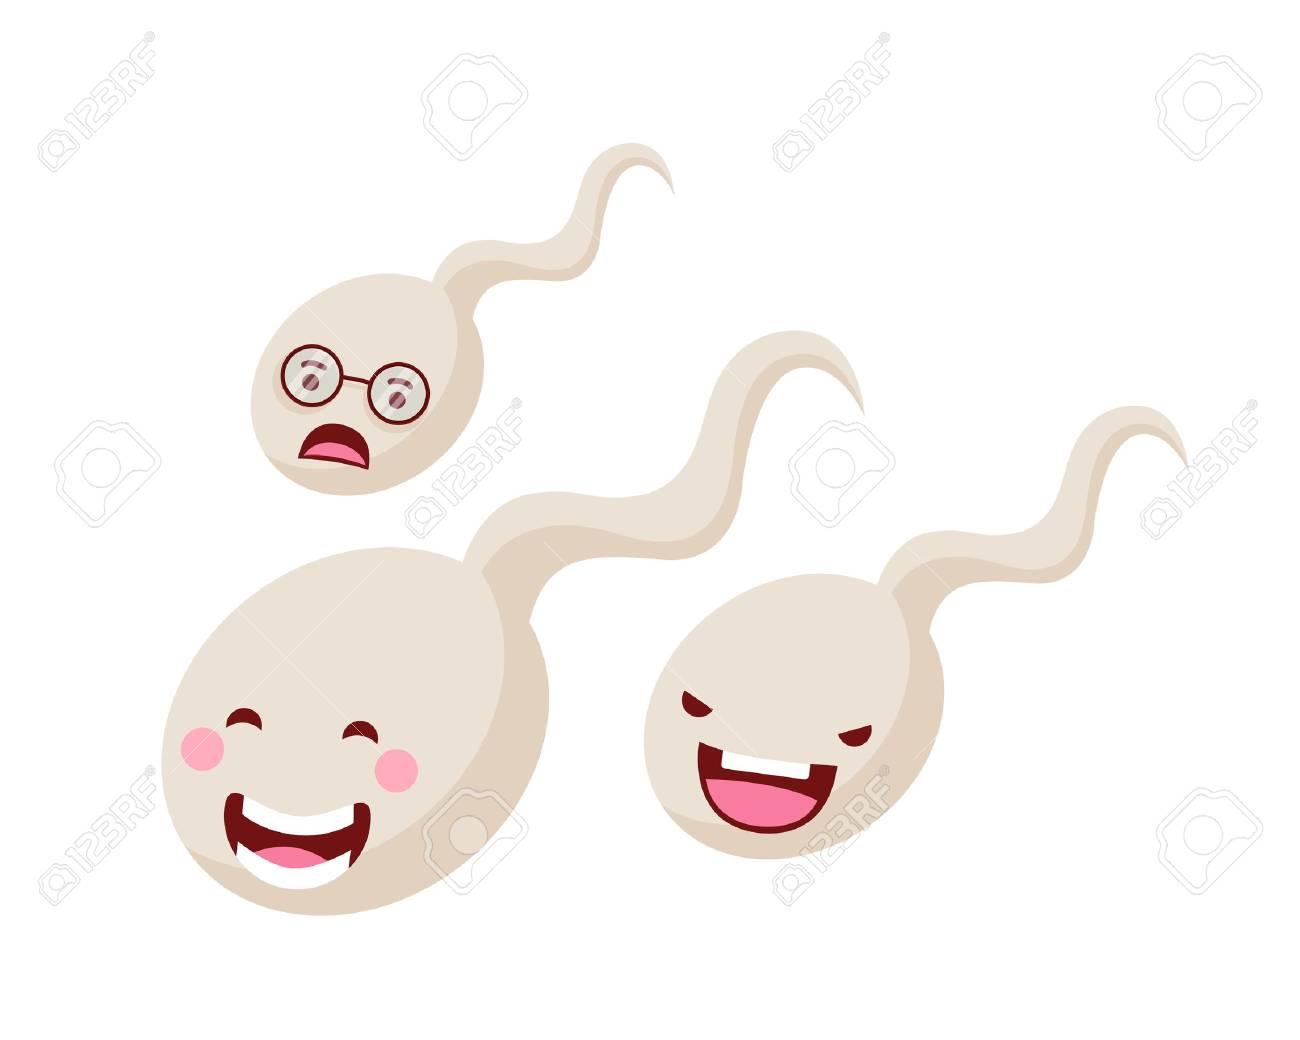 Dibujos Animados De La Anatomía Humana Feliz Y Linda Sana Dibujos ...